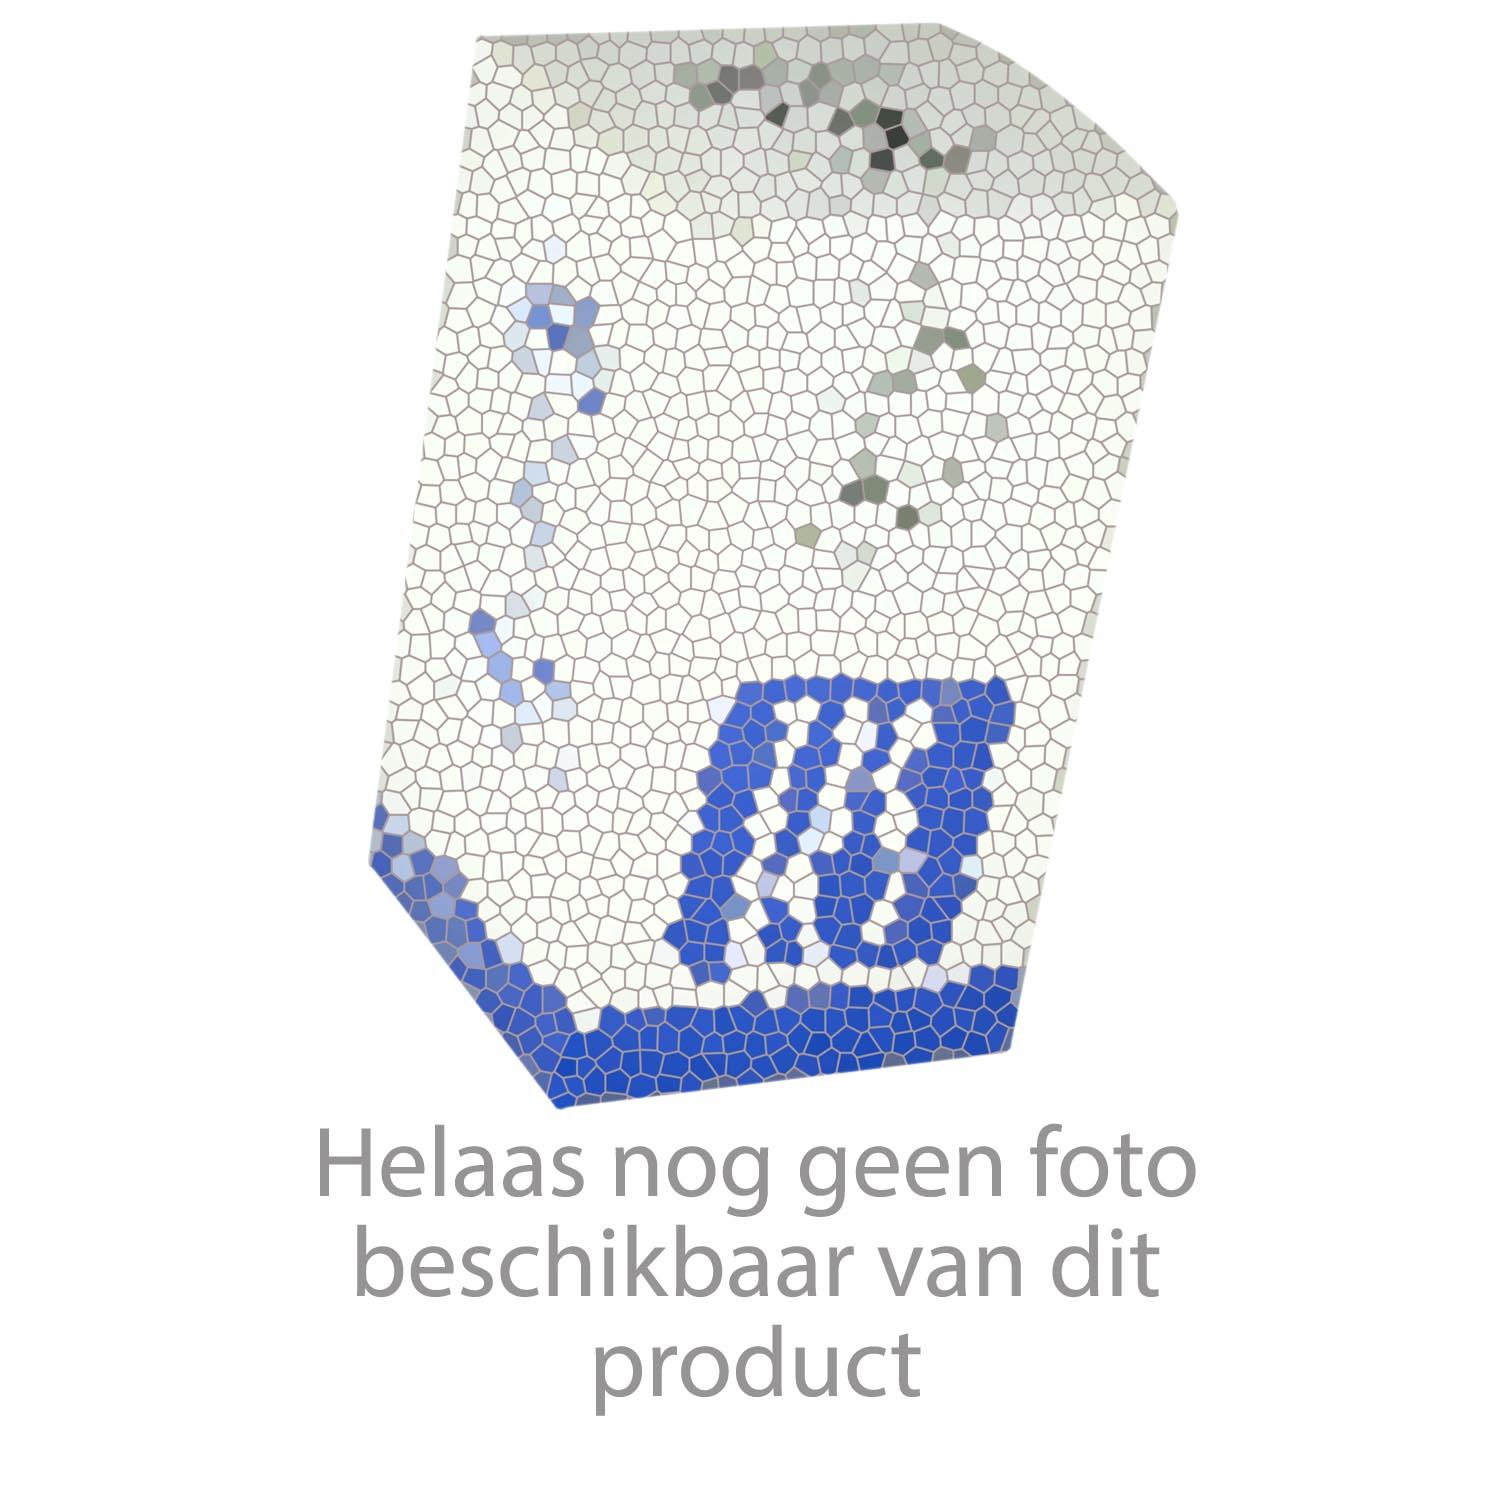 Grohe Onderdelen Allure Wastafelkraan Driegats wastafelmengkraan S-Size Artikelnummer 20189000